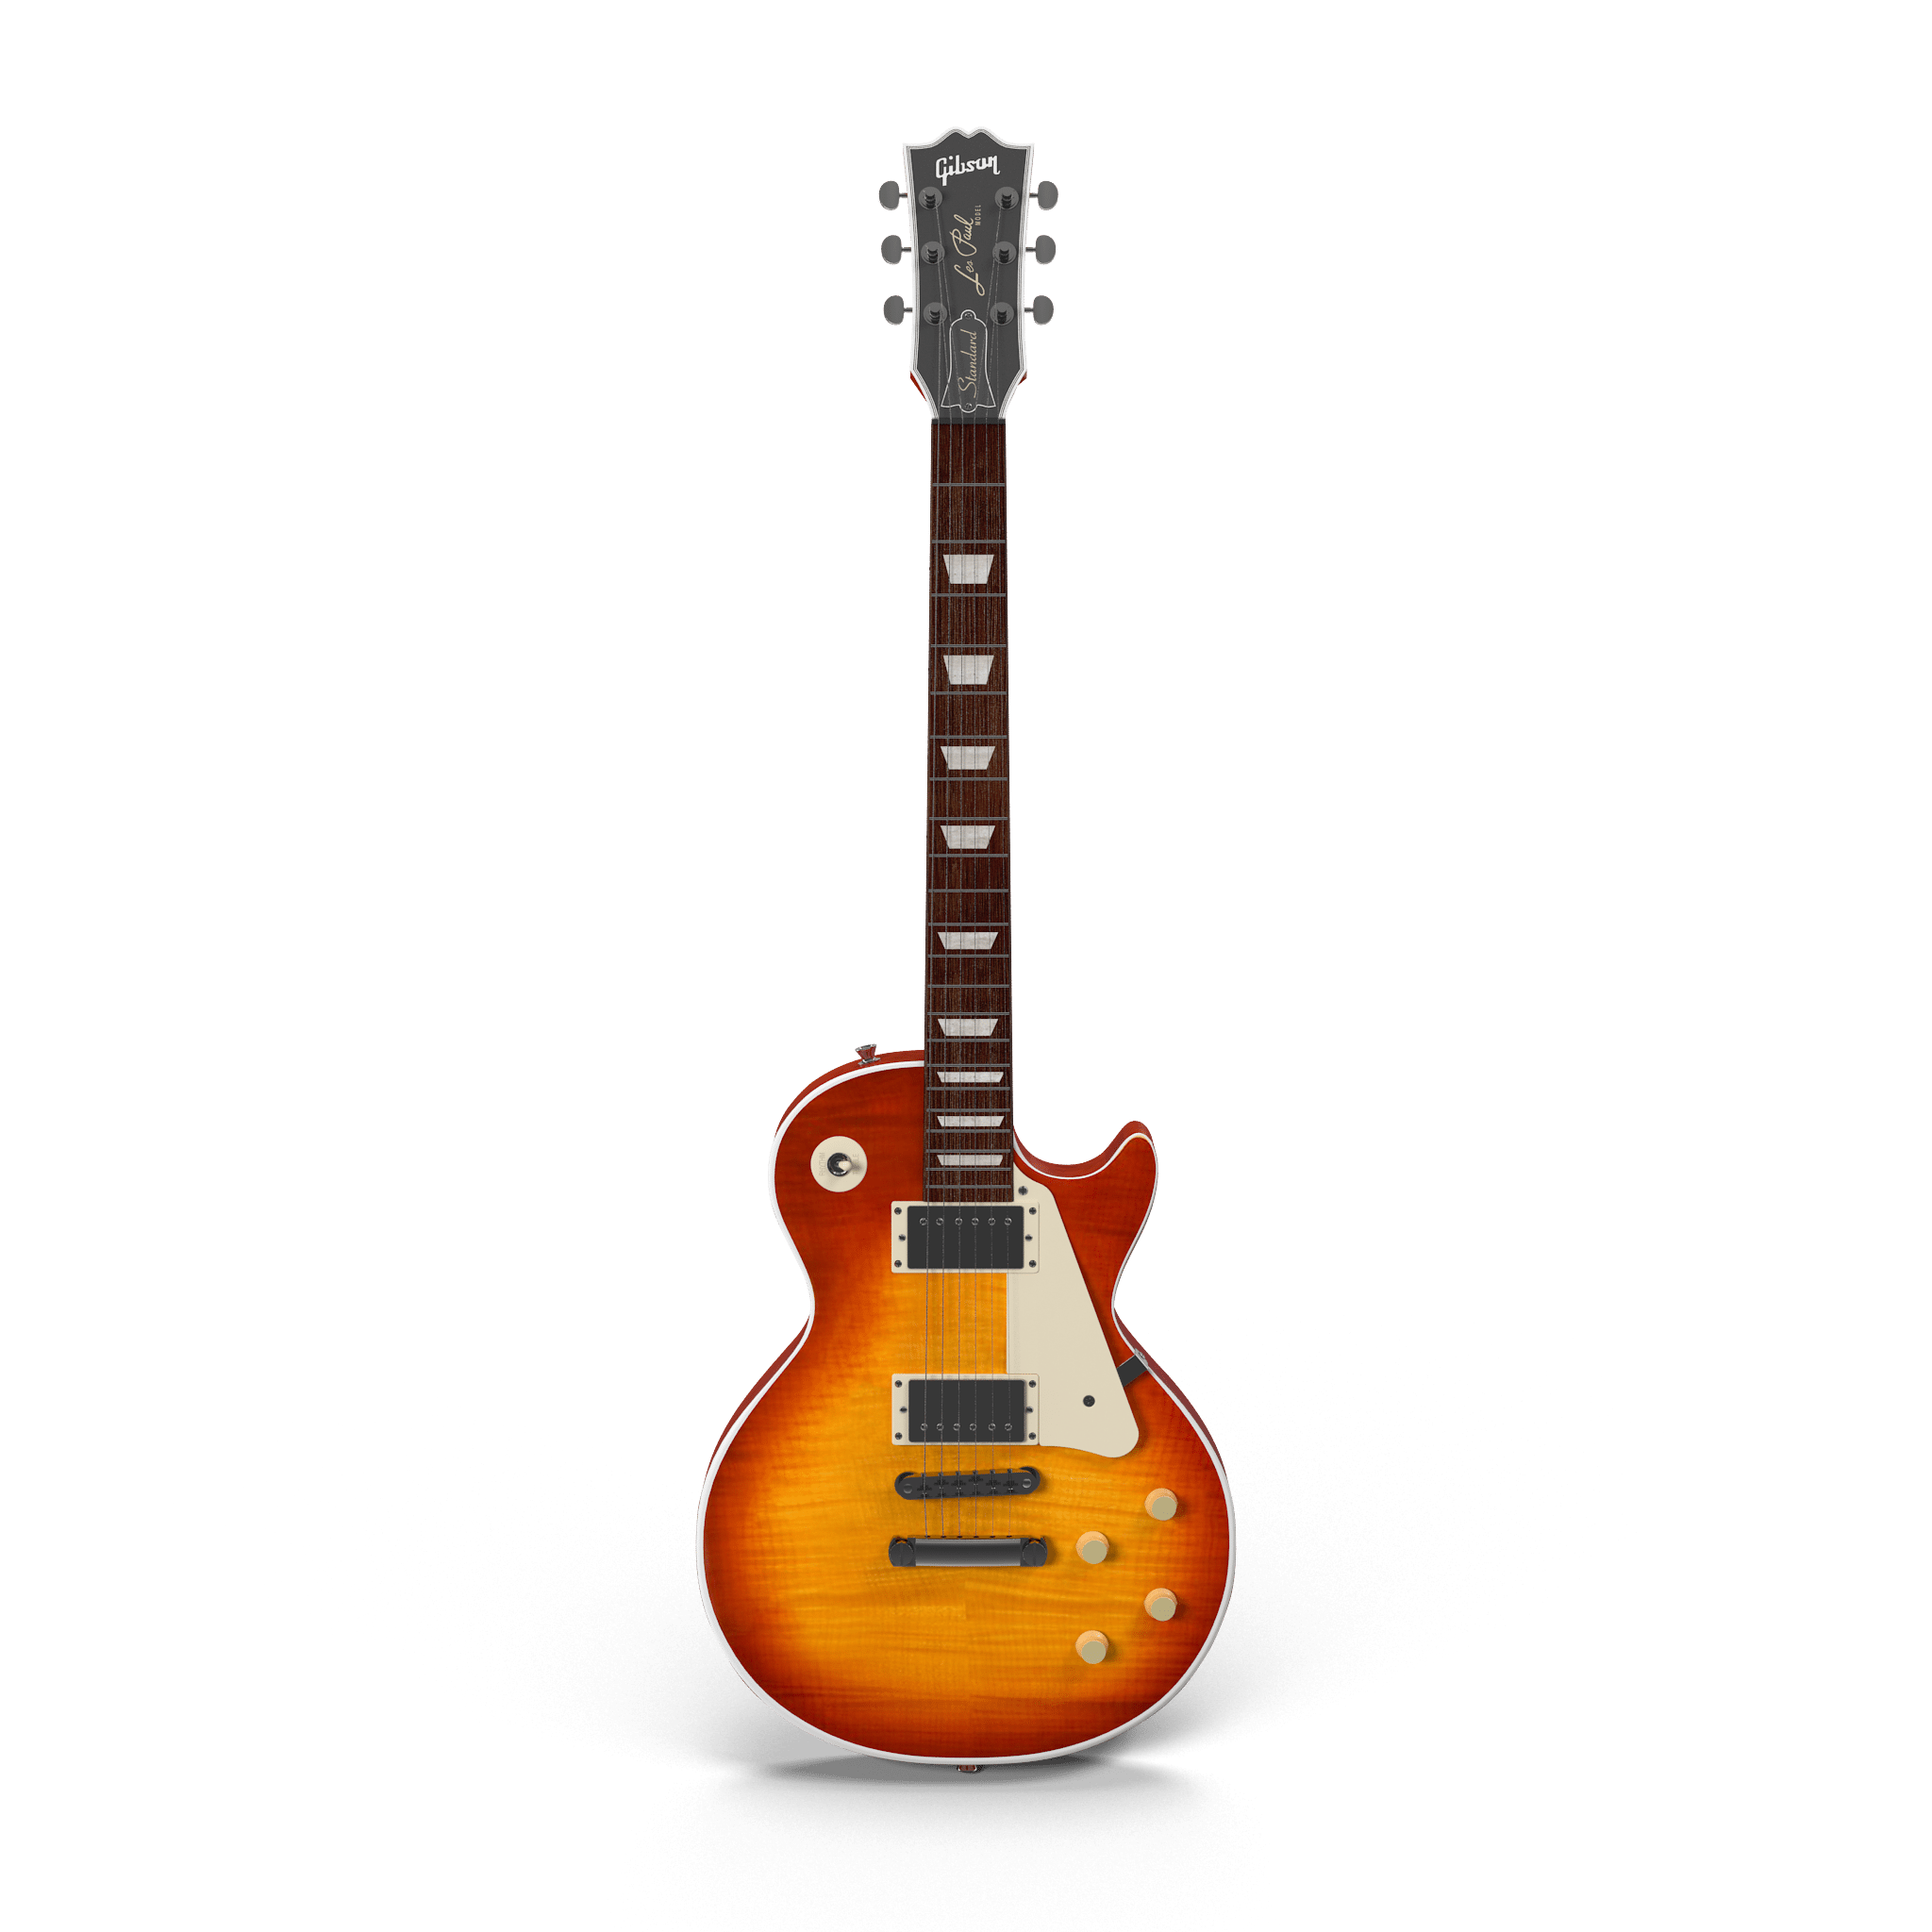 Old-School Beautiful Guitar Mockup